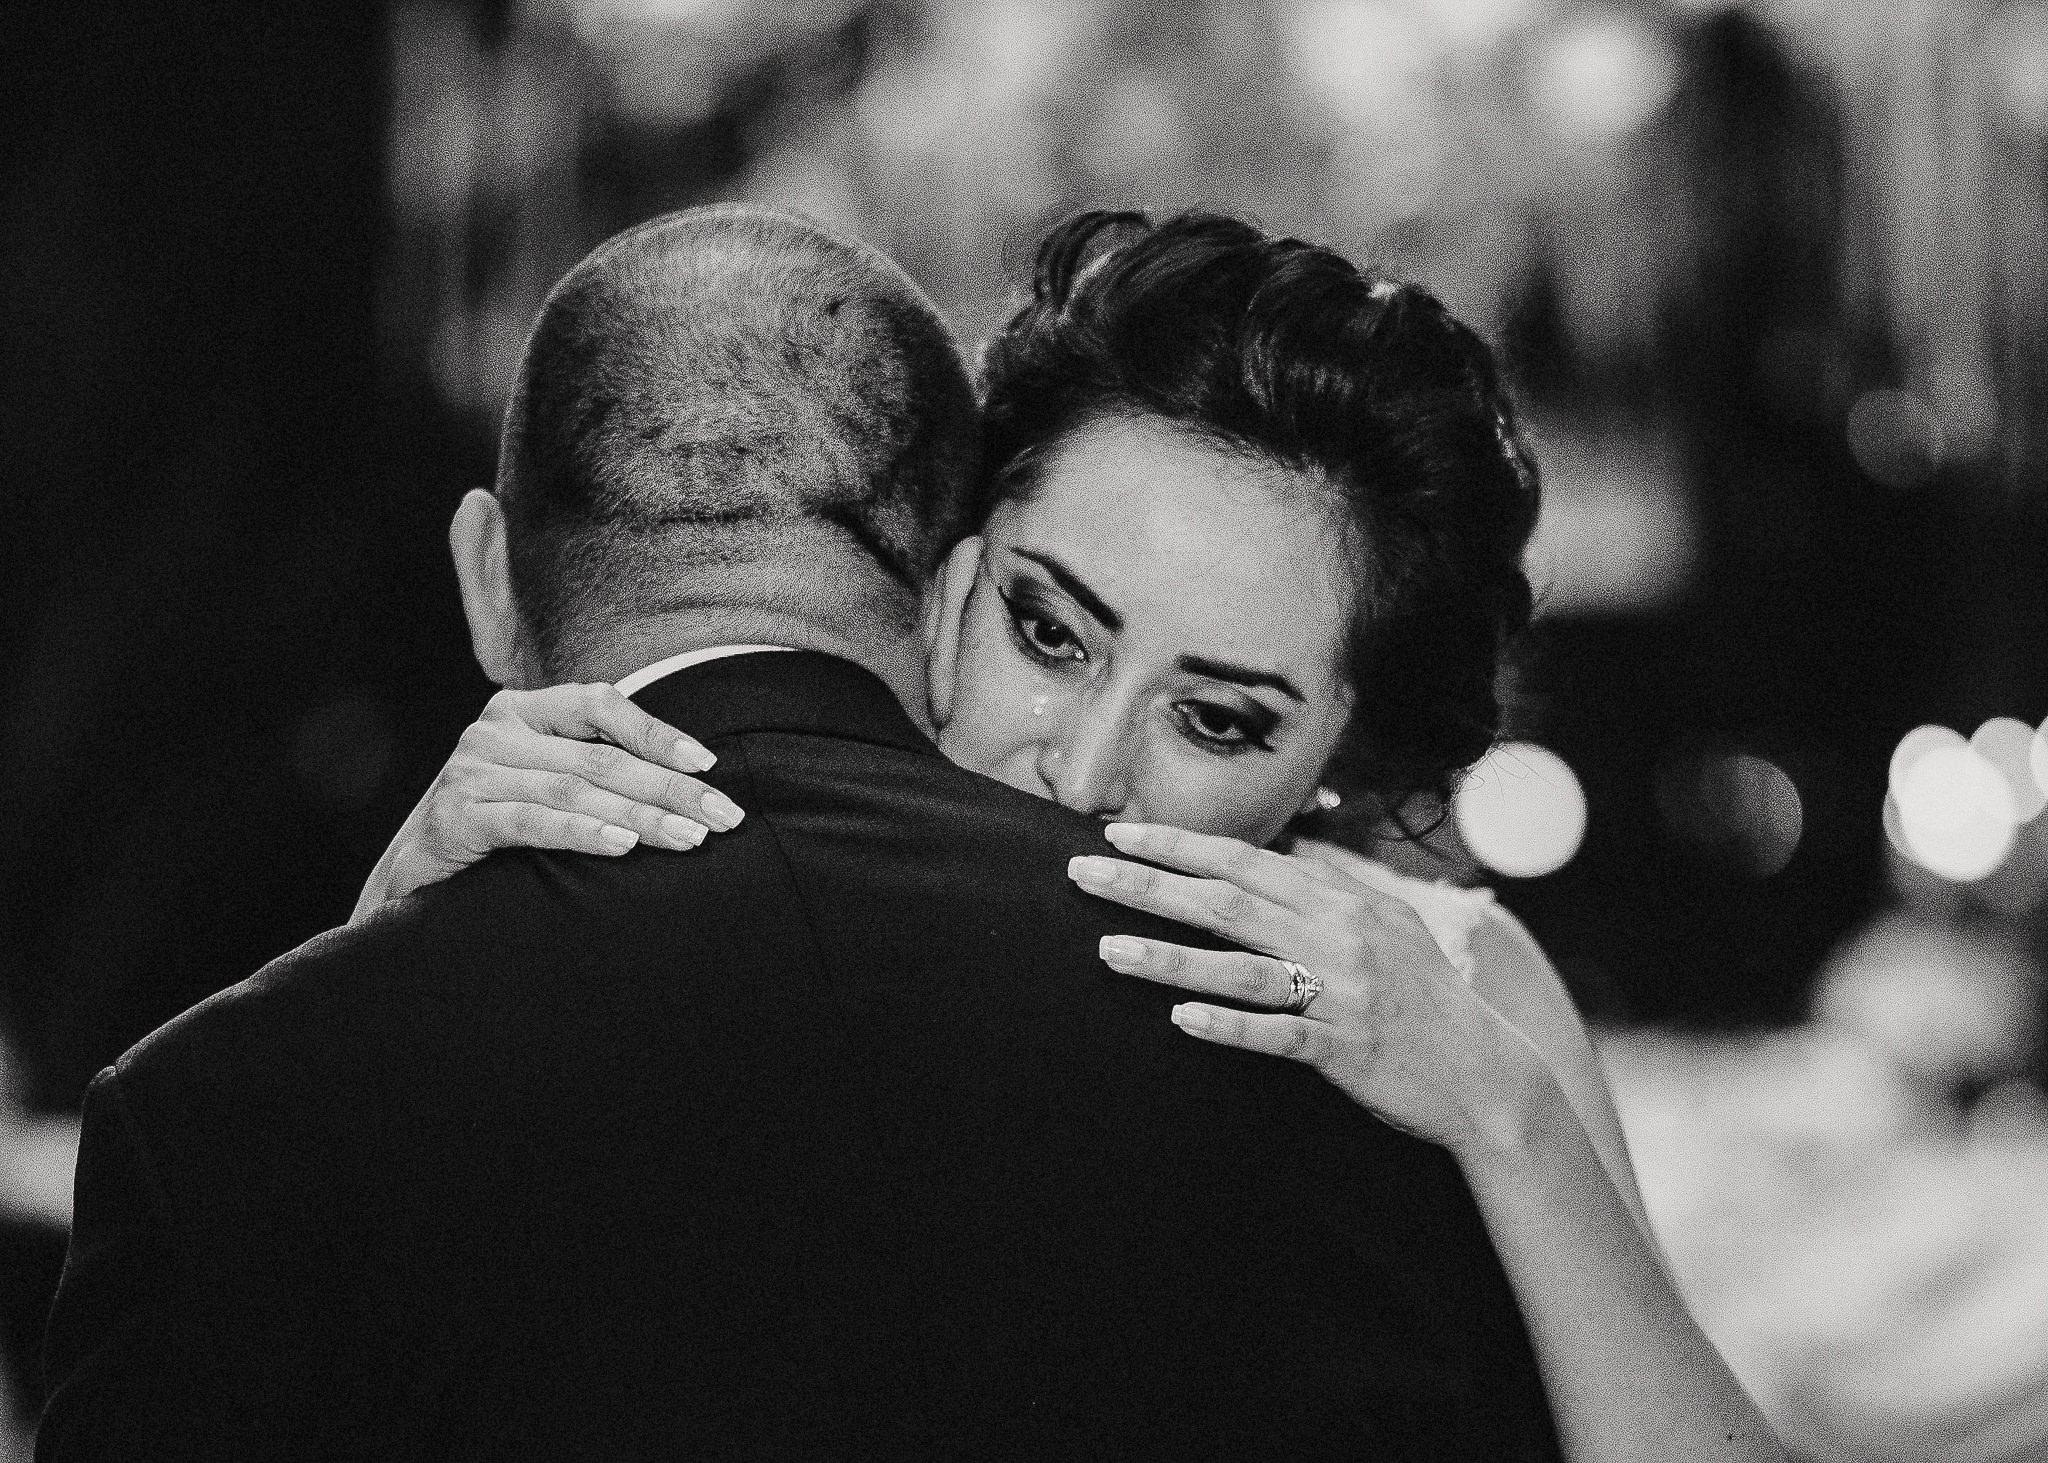 Wedding-Boda-Tulancingo-Hidalgo-Salon-Essenzia-Luis-Houdin-50-film